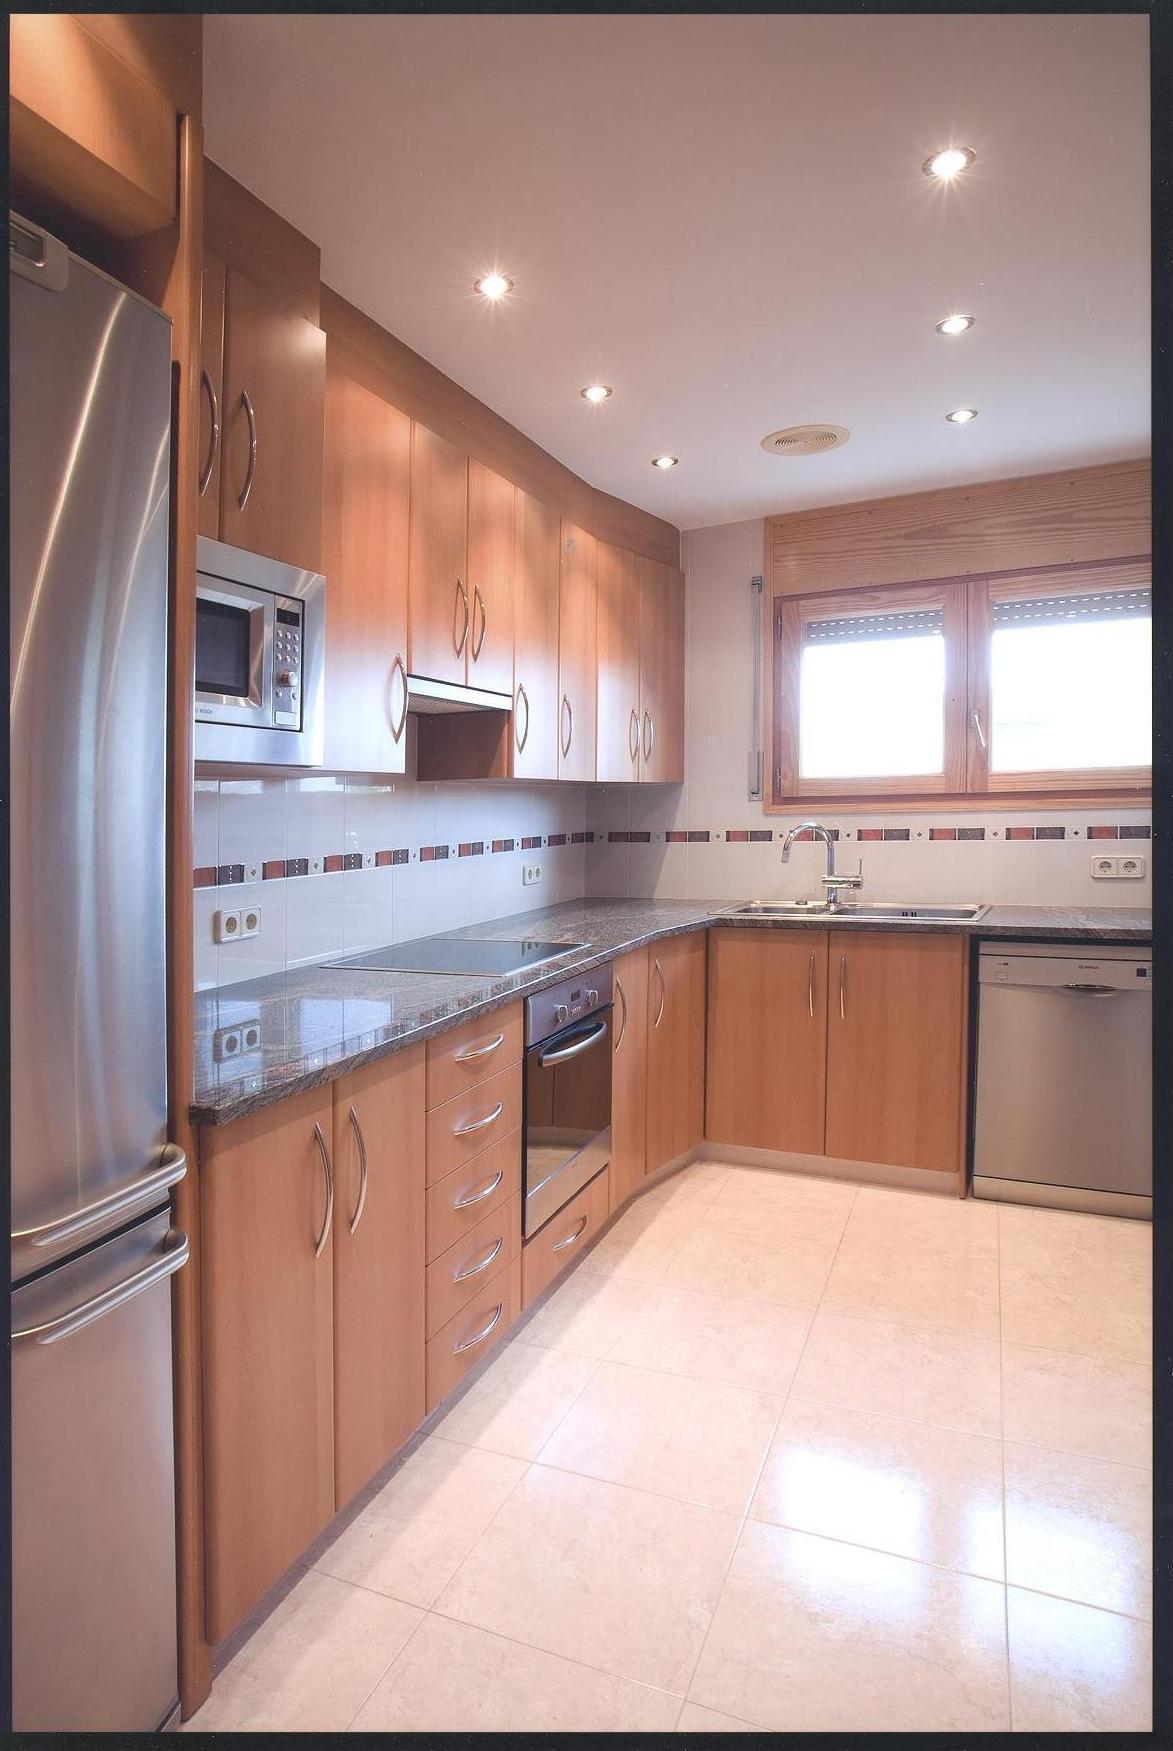 Muebles de cocina: Catálogo de Fustería i Moble de Diseny Albert Prat